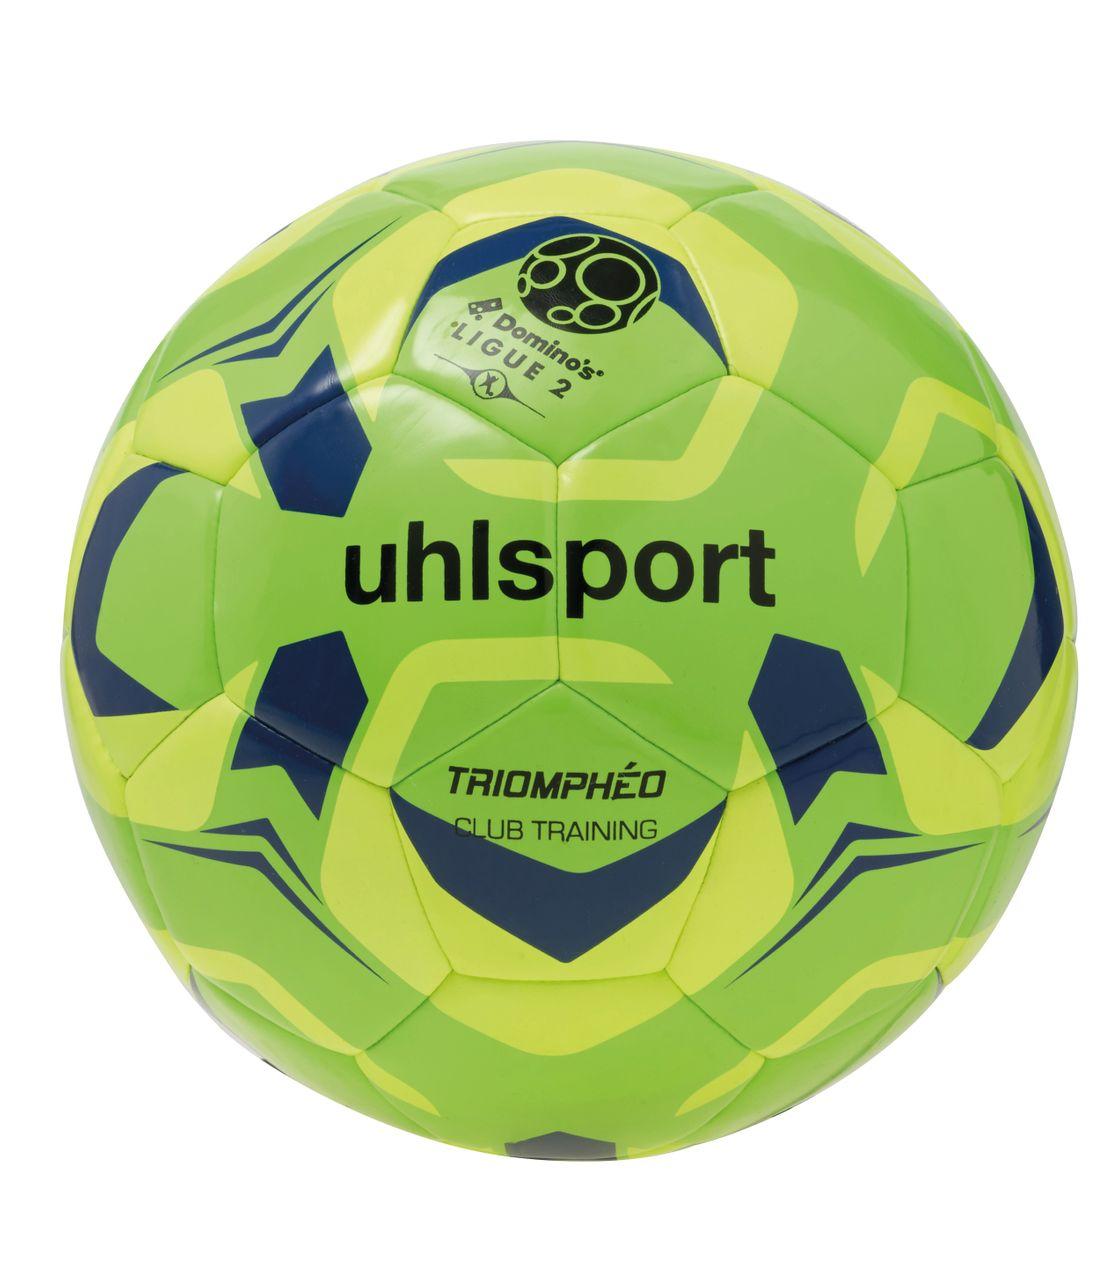 Uhlsport Trainingsball TRIOMPHÉO CLUB TRAINING